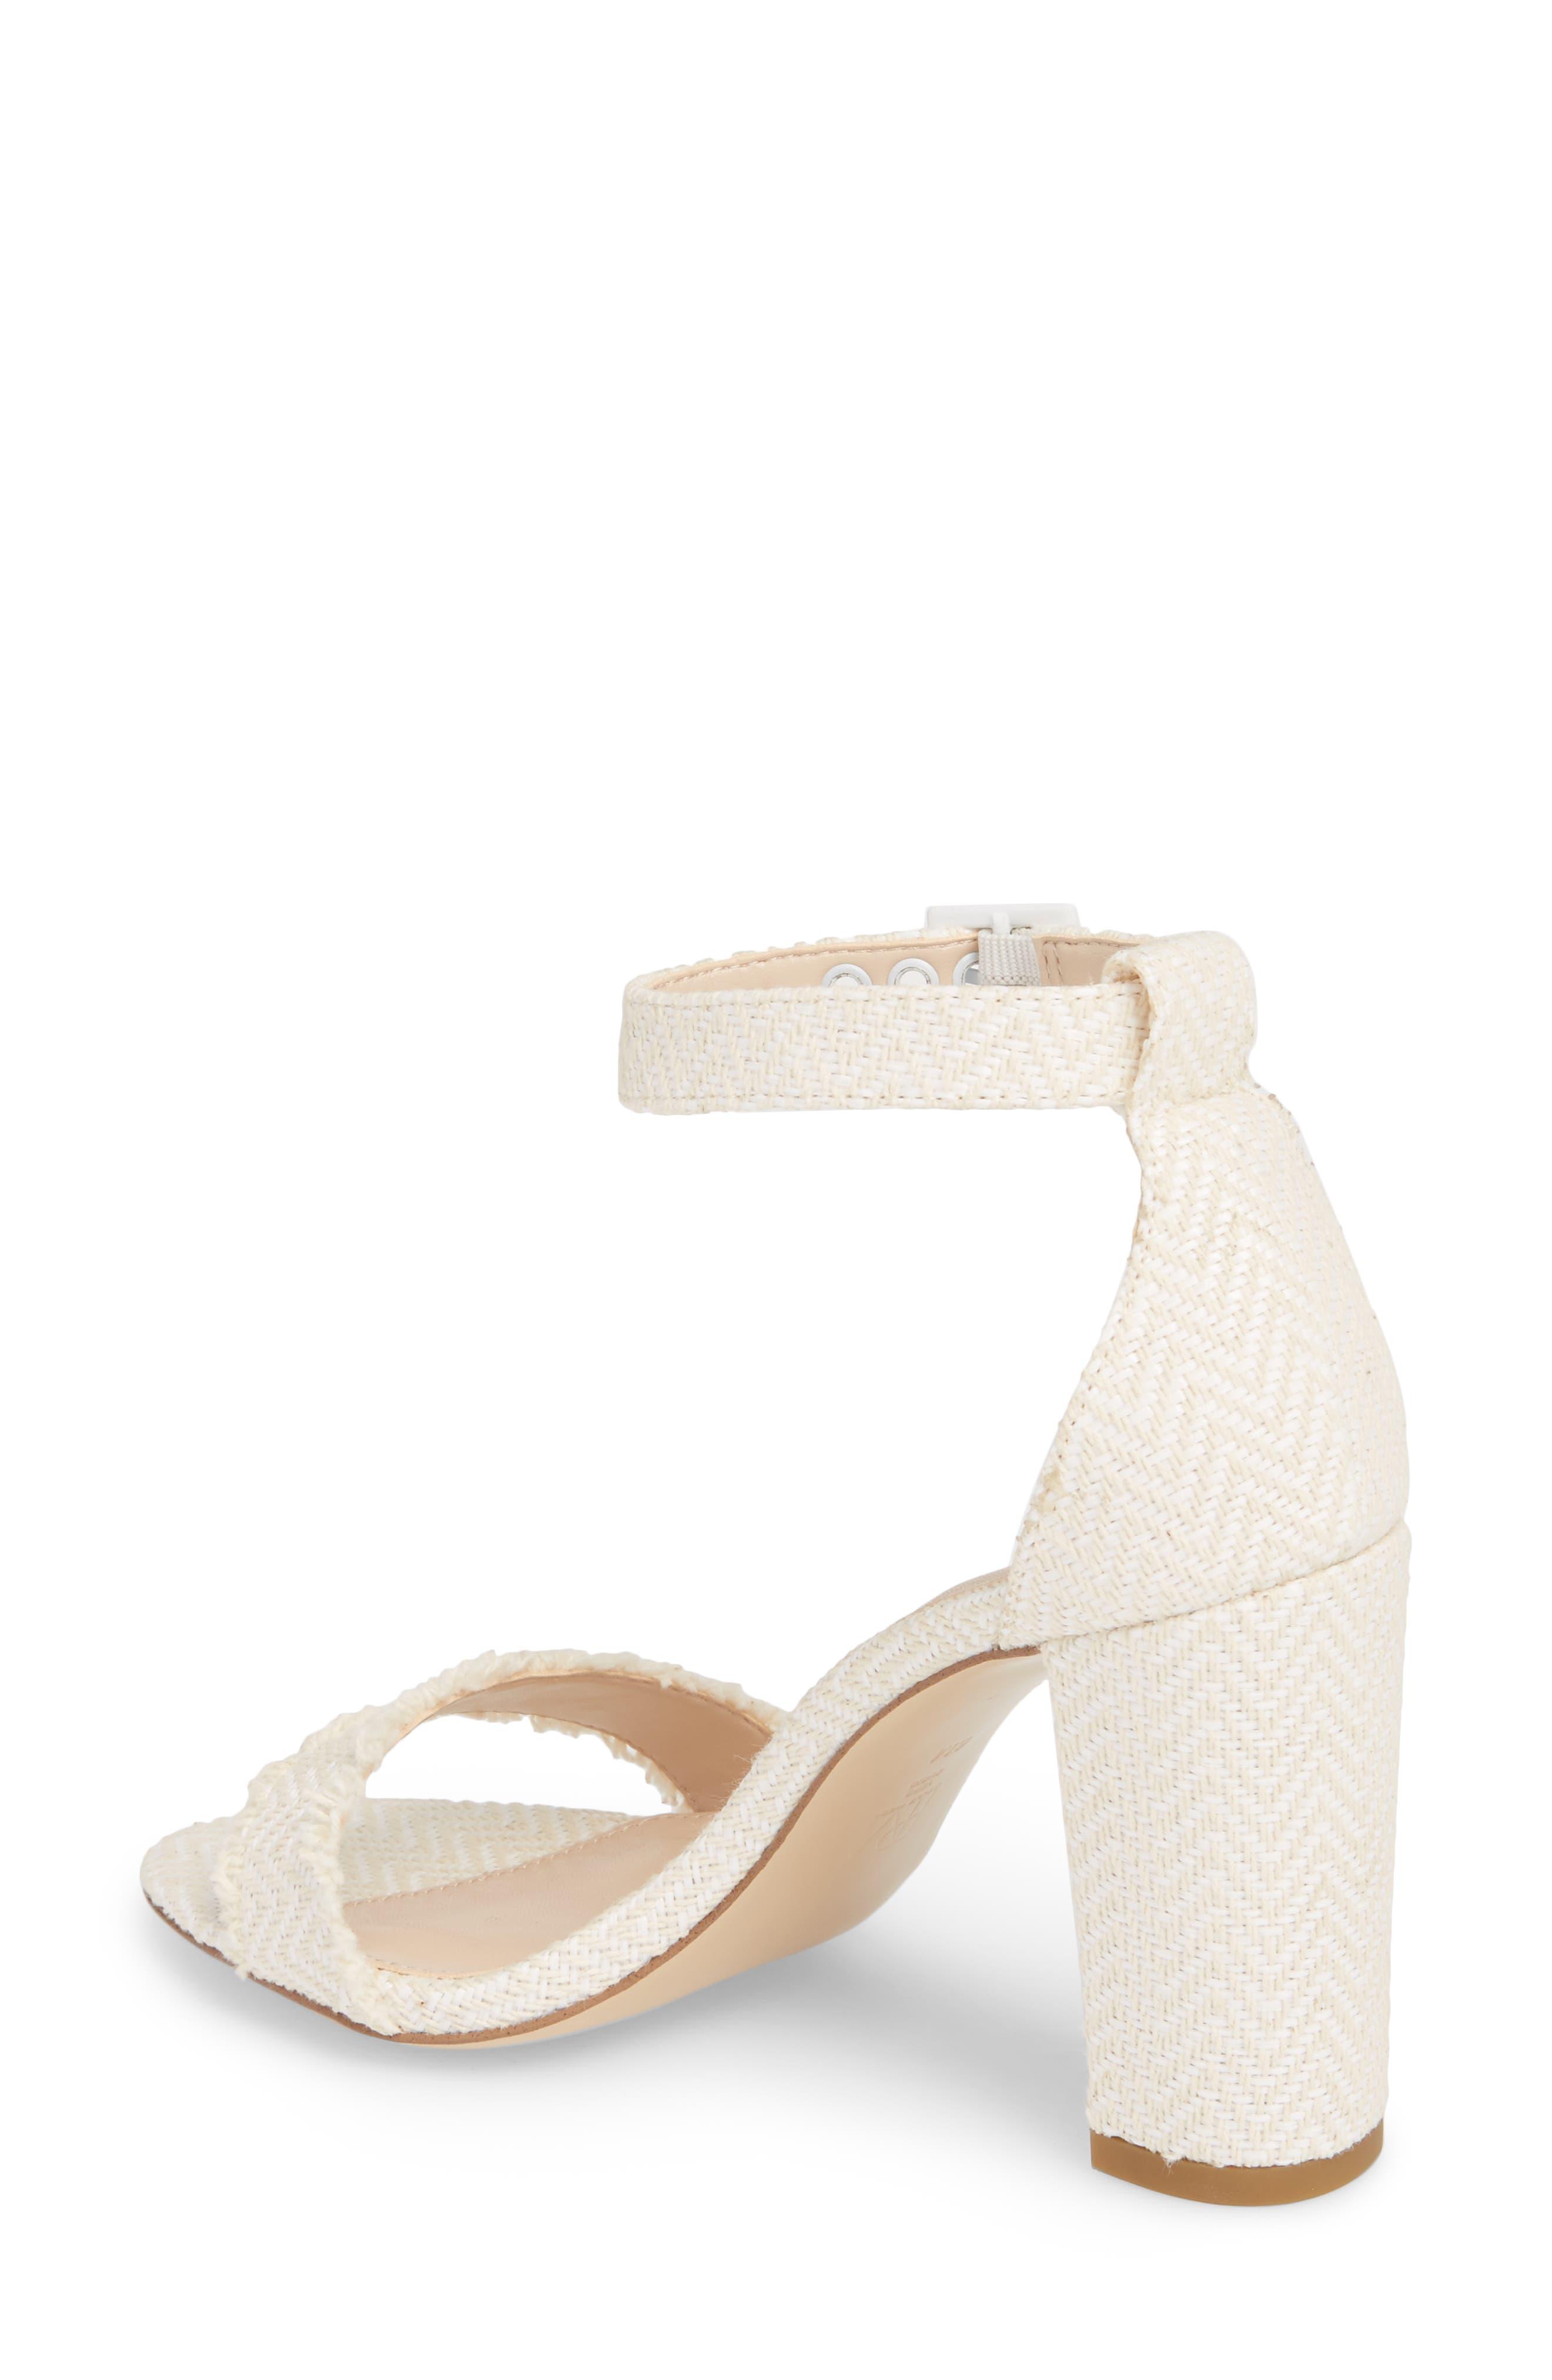 Bonnie Ankle Strap Sandal,                             Alternate thumbnail 2, color,                             White Herringbone